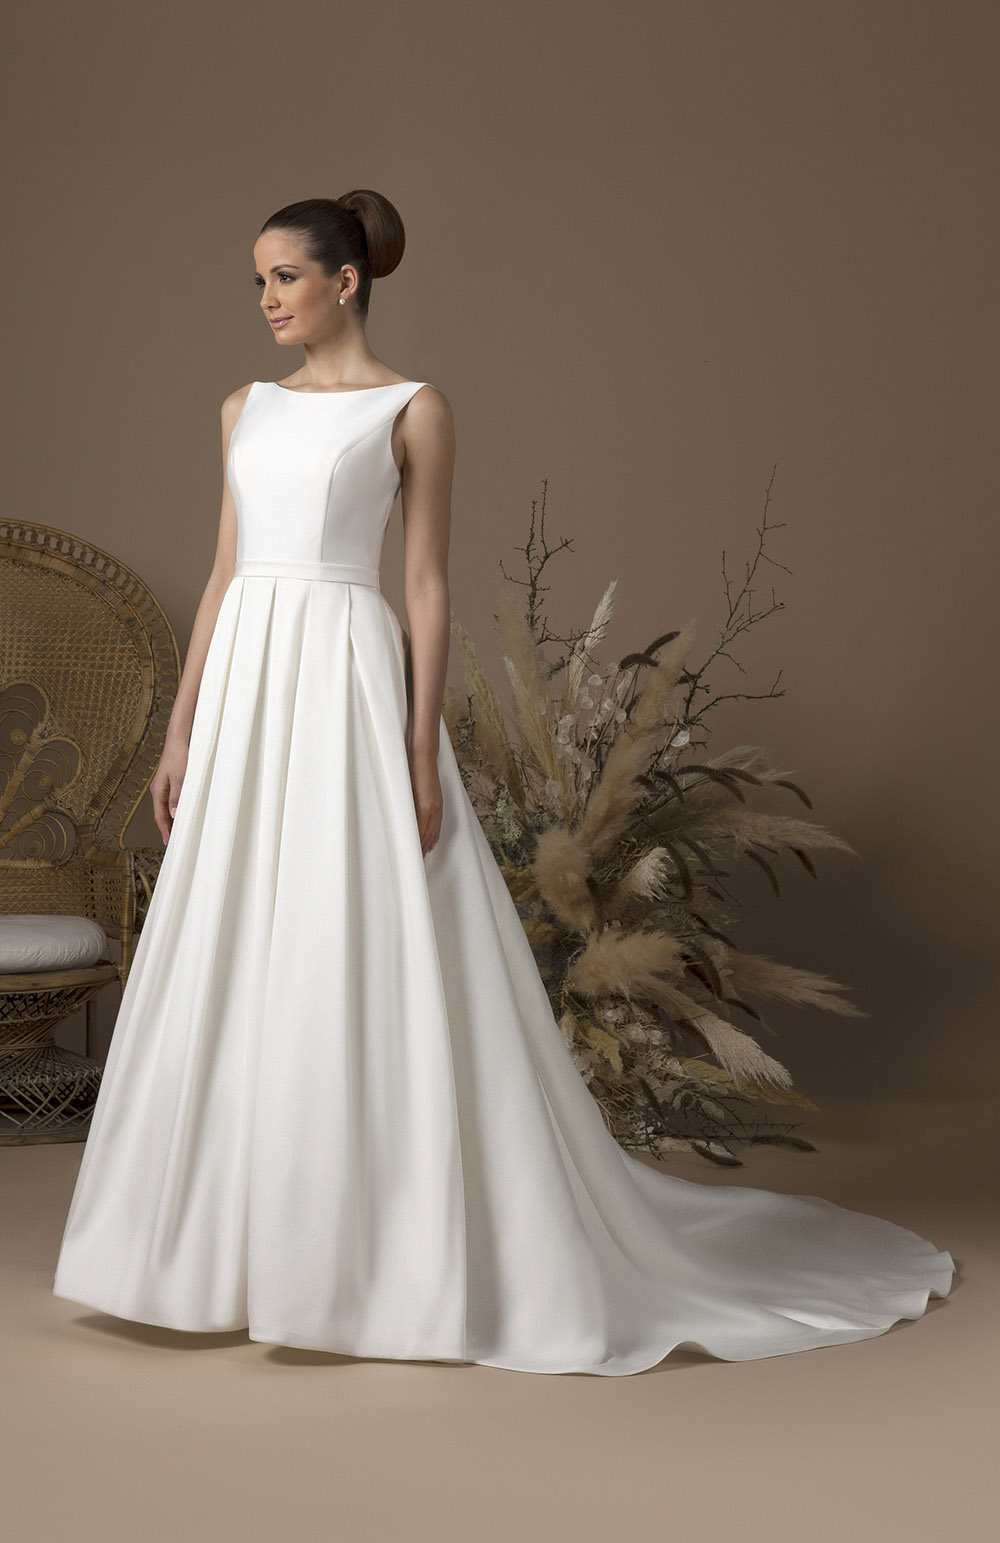 Robe de mariée Modèle Delya